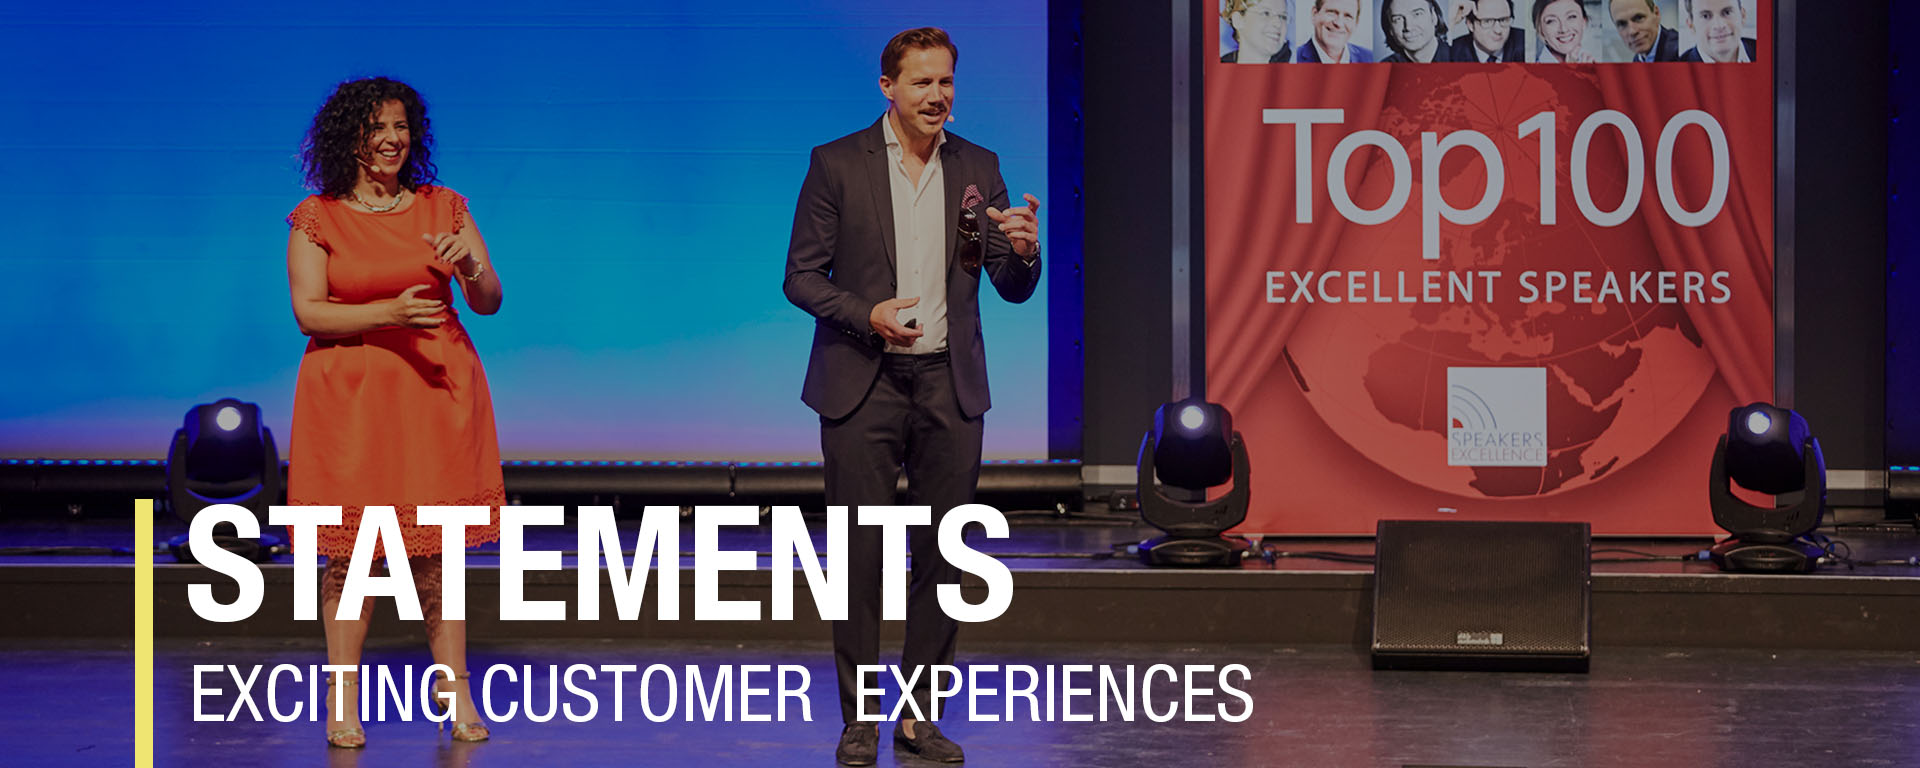 MEDURI & SPANU customer testimonials, reviews